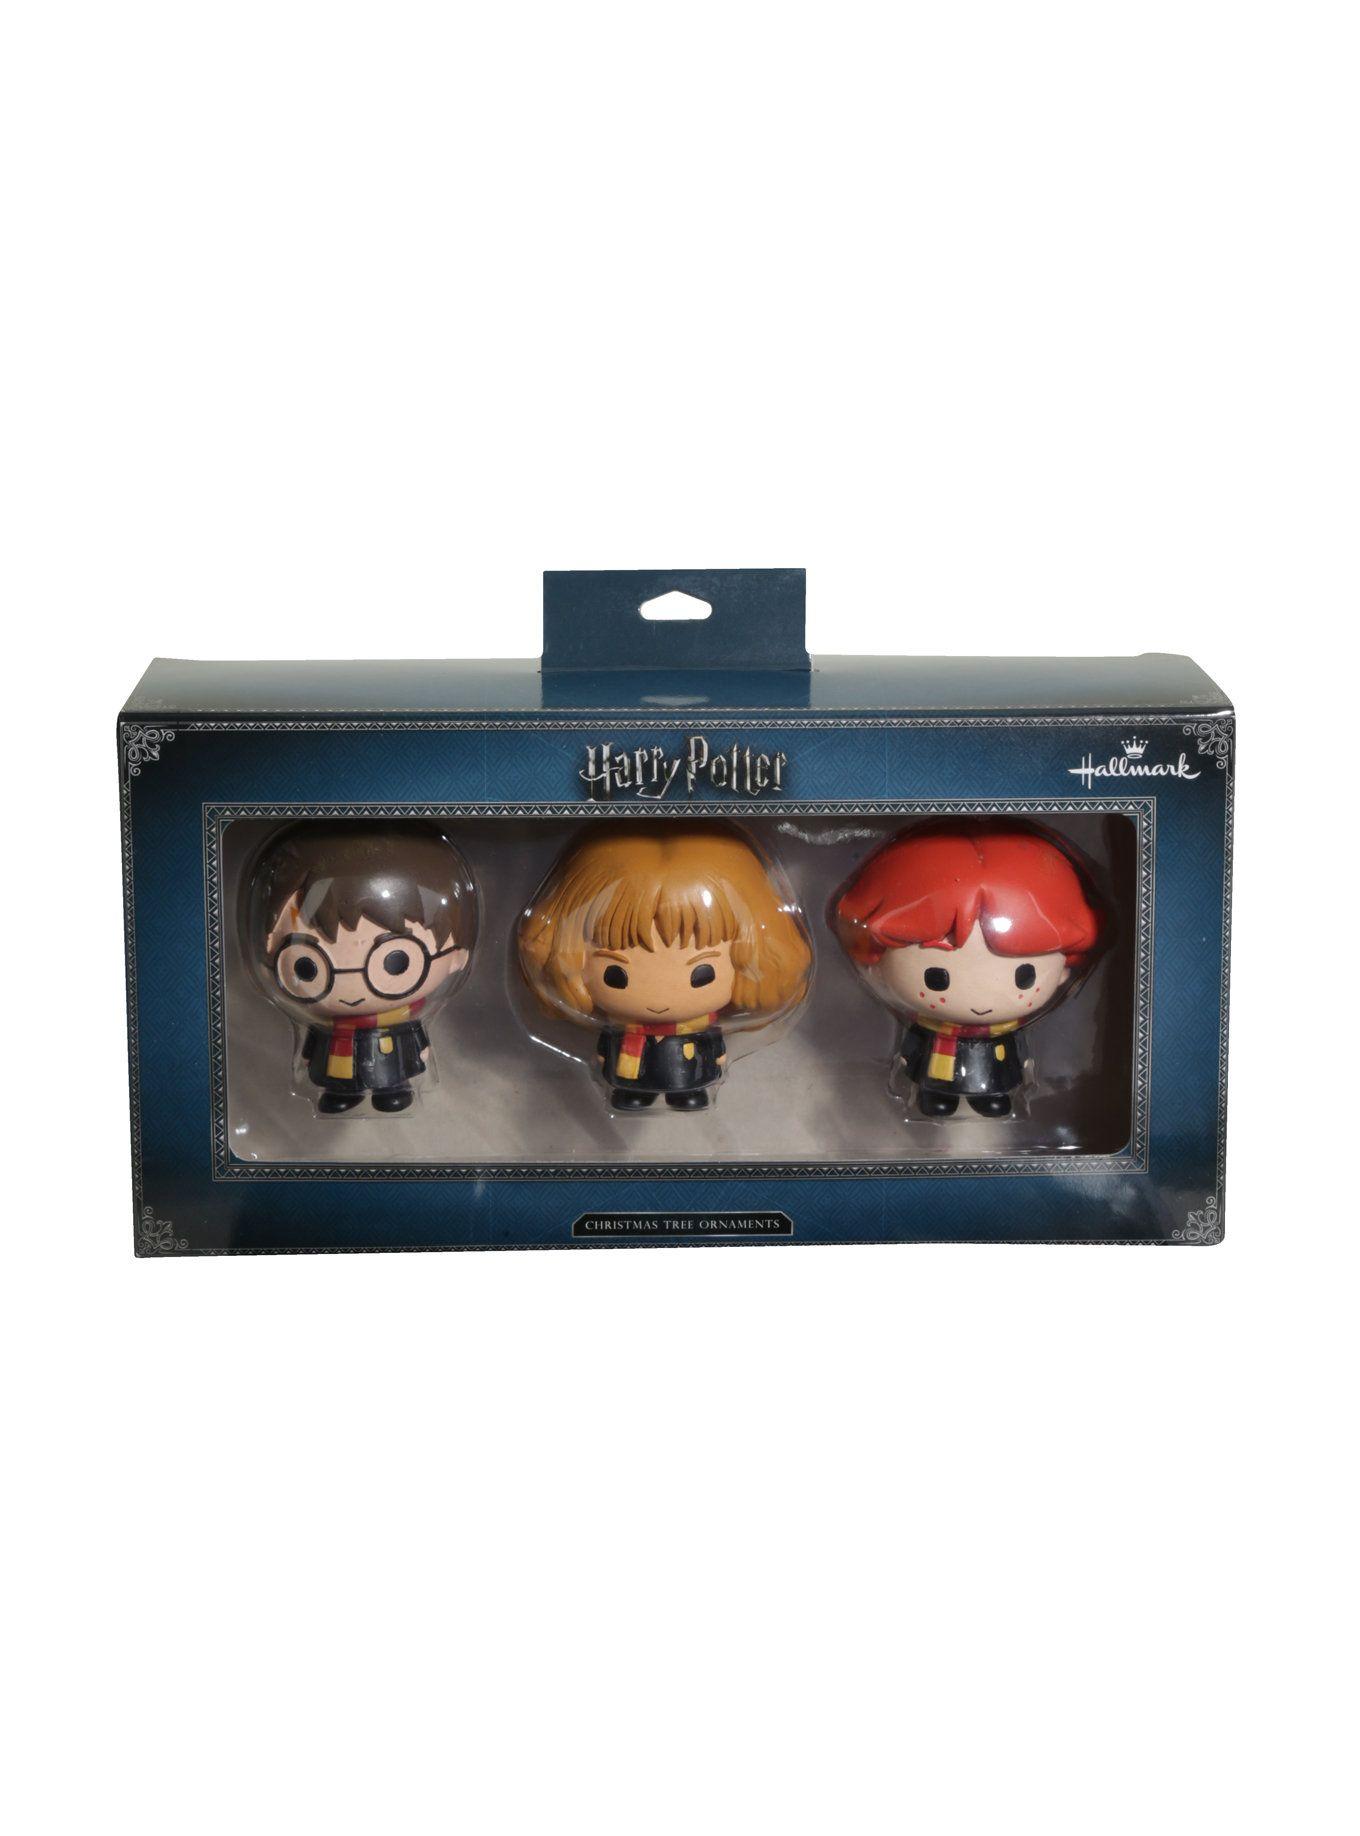 Harry Potter Chibi Ron Harry Hermione Ornament Set Harry Potter Ornaments Nerd Christmas Harry Potter Merch